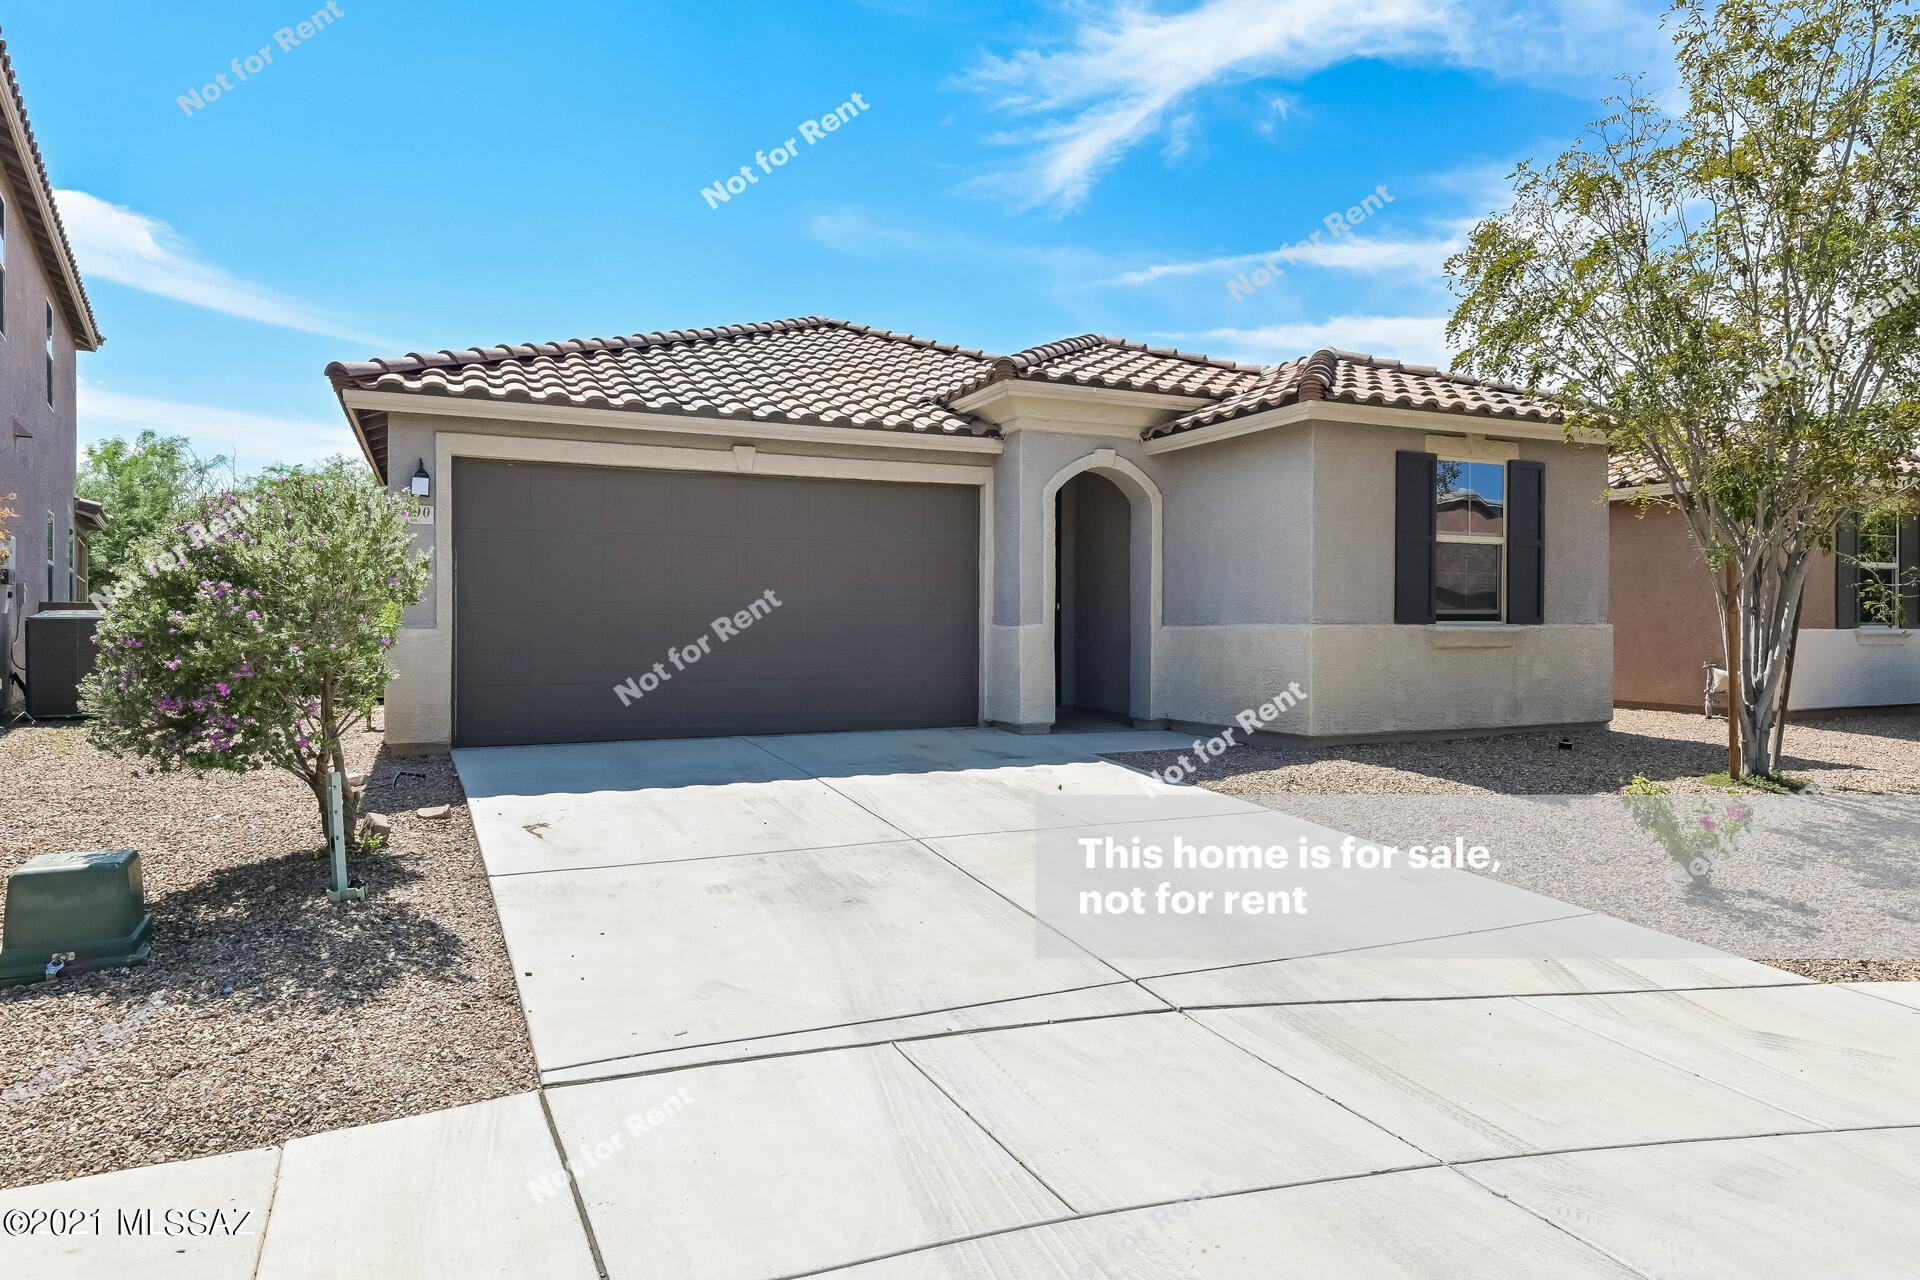 5190 E Arguedas Way, Tucson, AZ 85756 - MLS#: 22123547